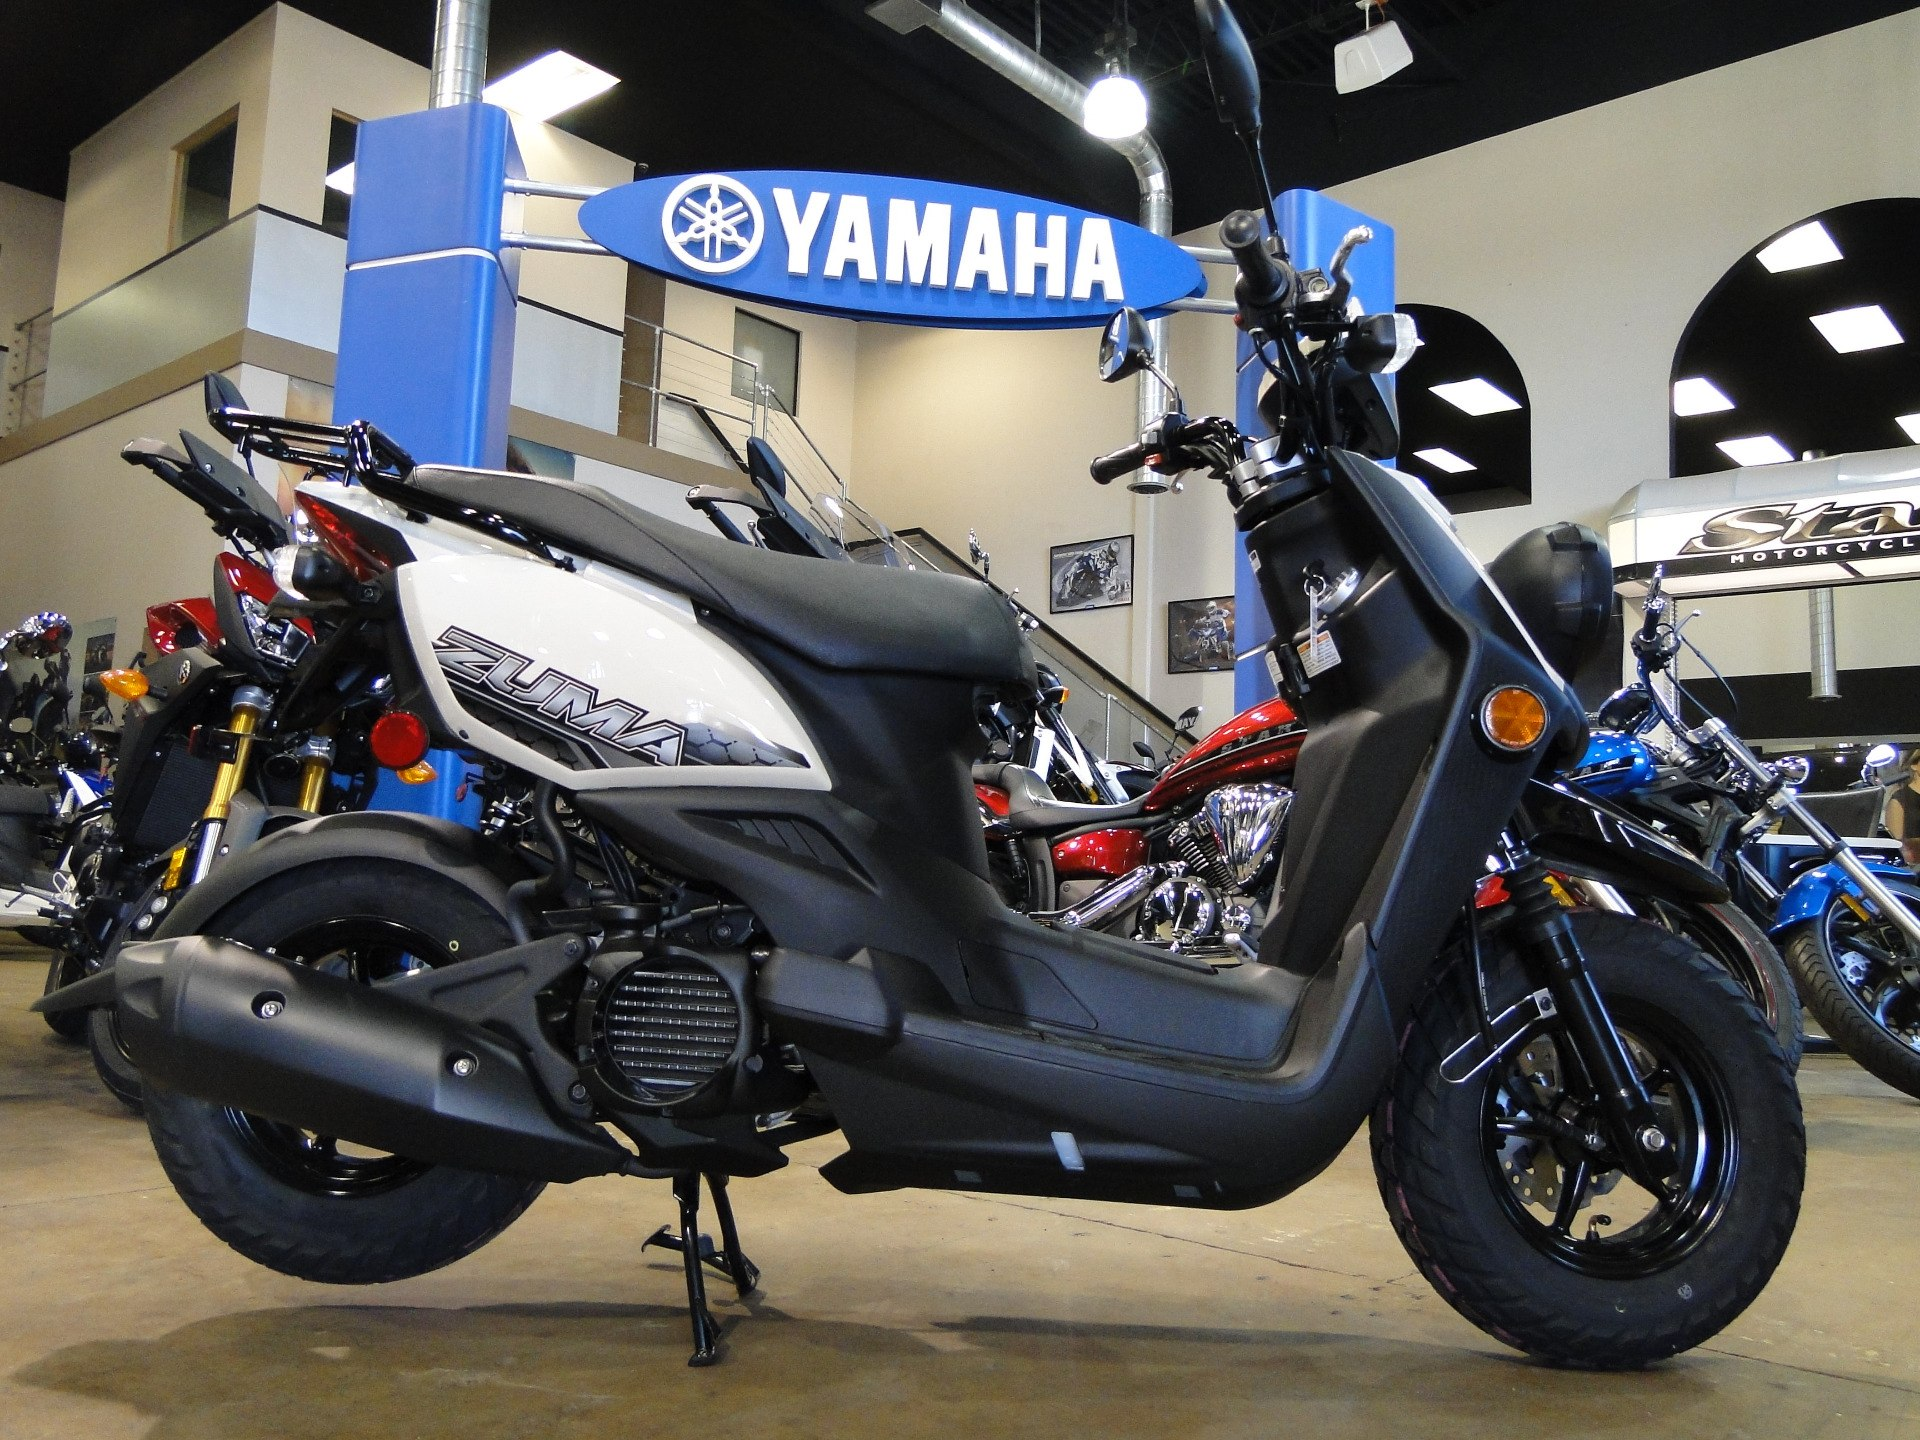 2016 Yamaha Zuma 50F in Denver, Colorado